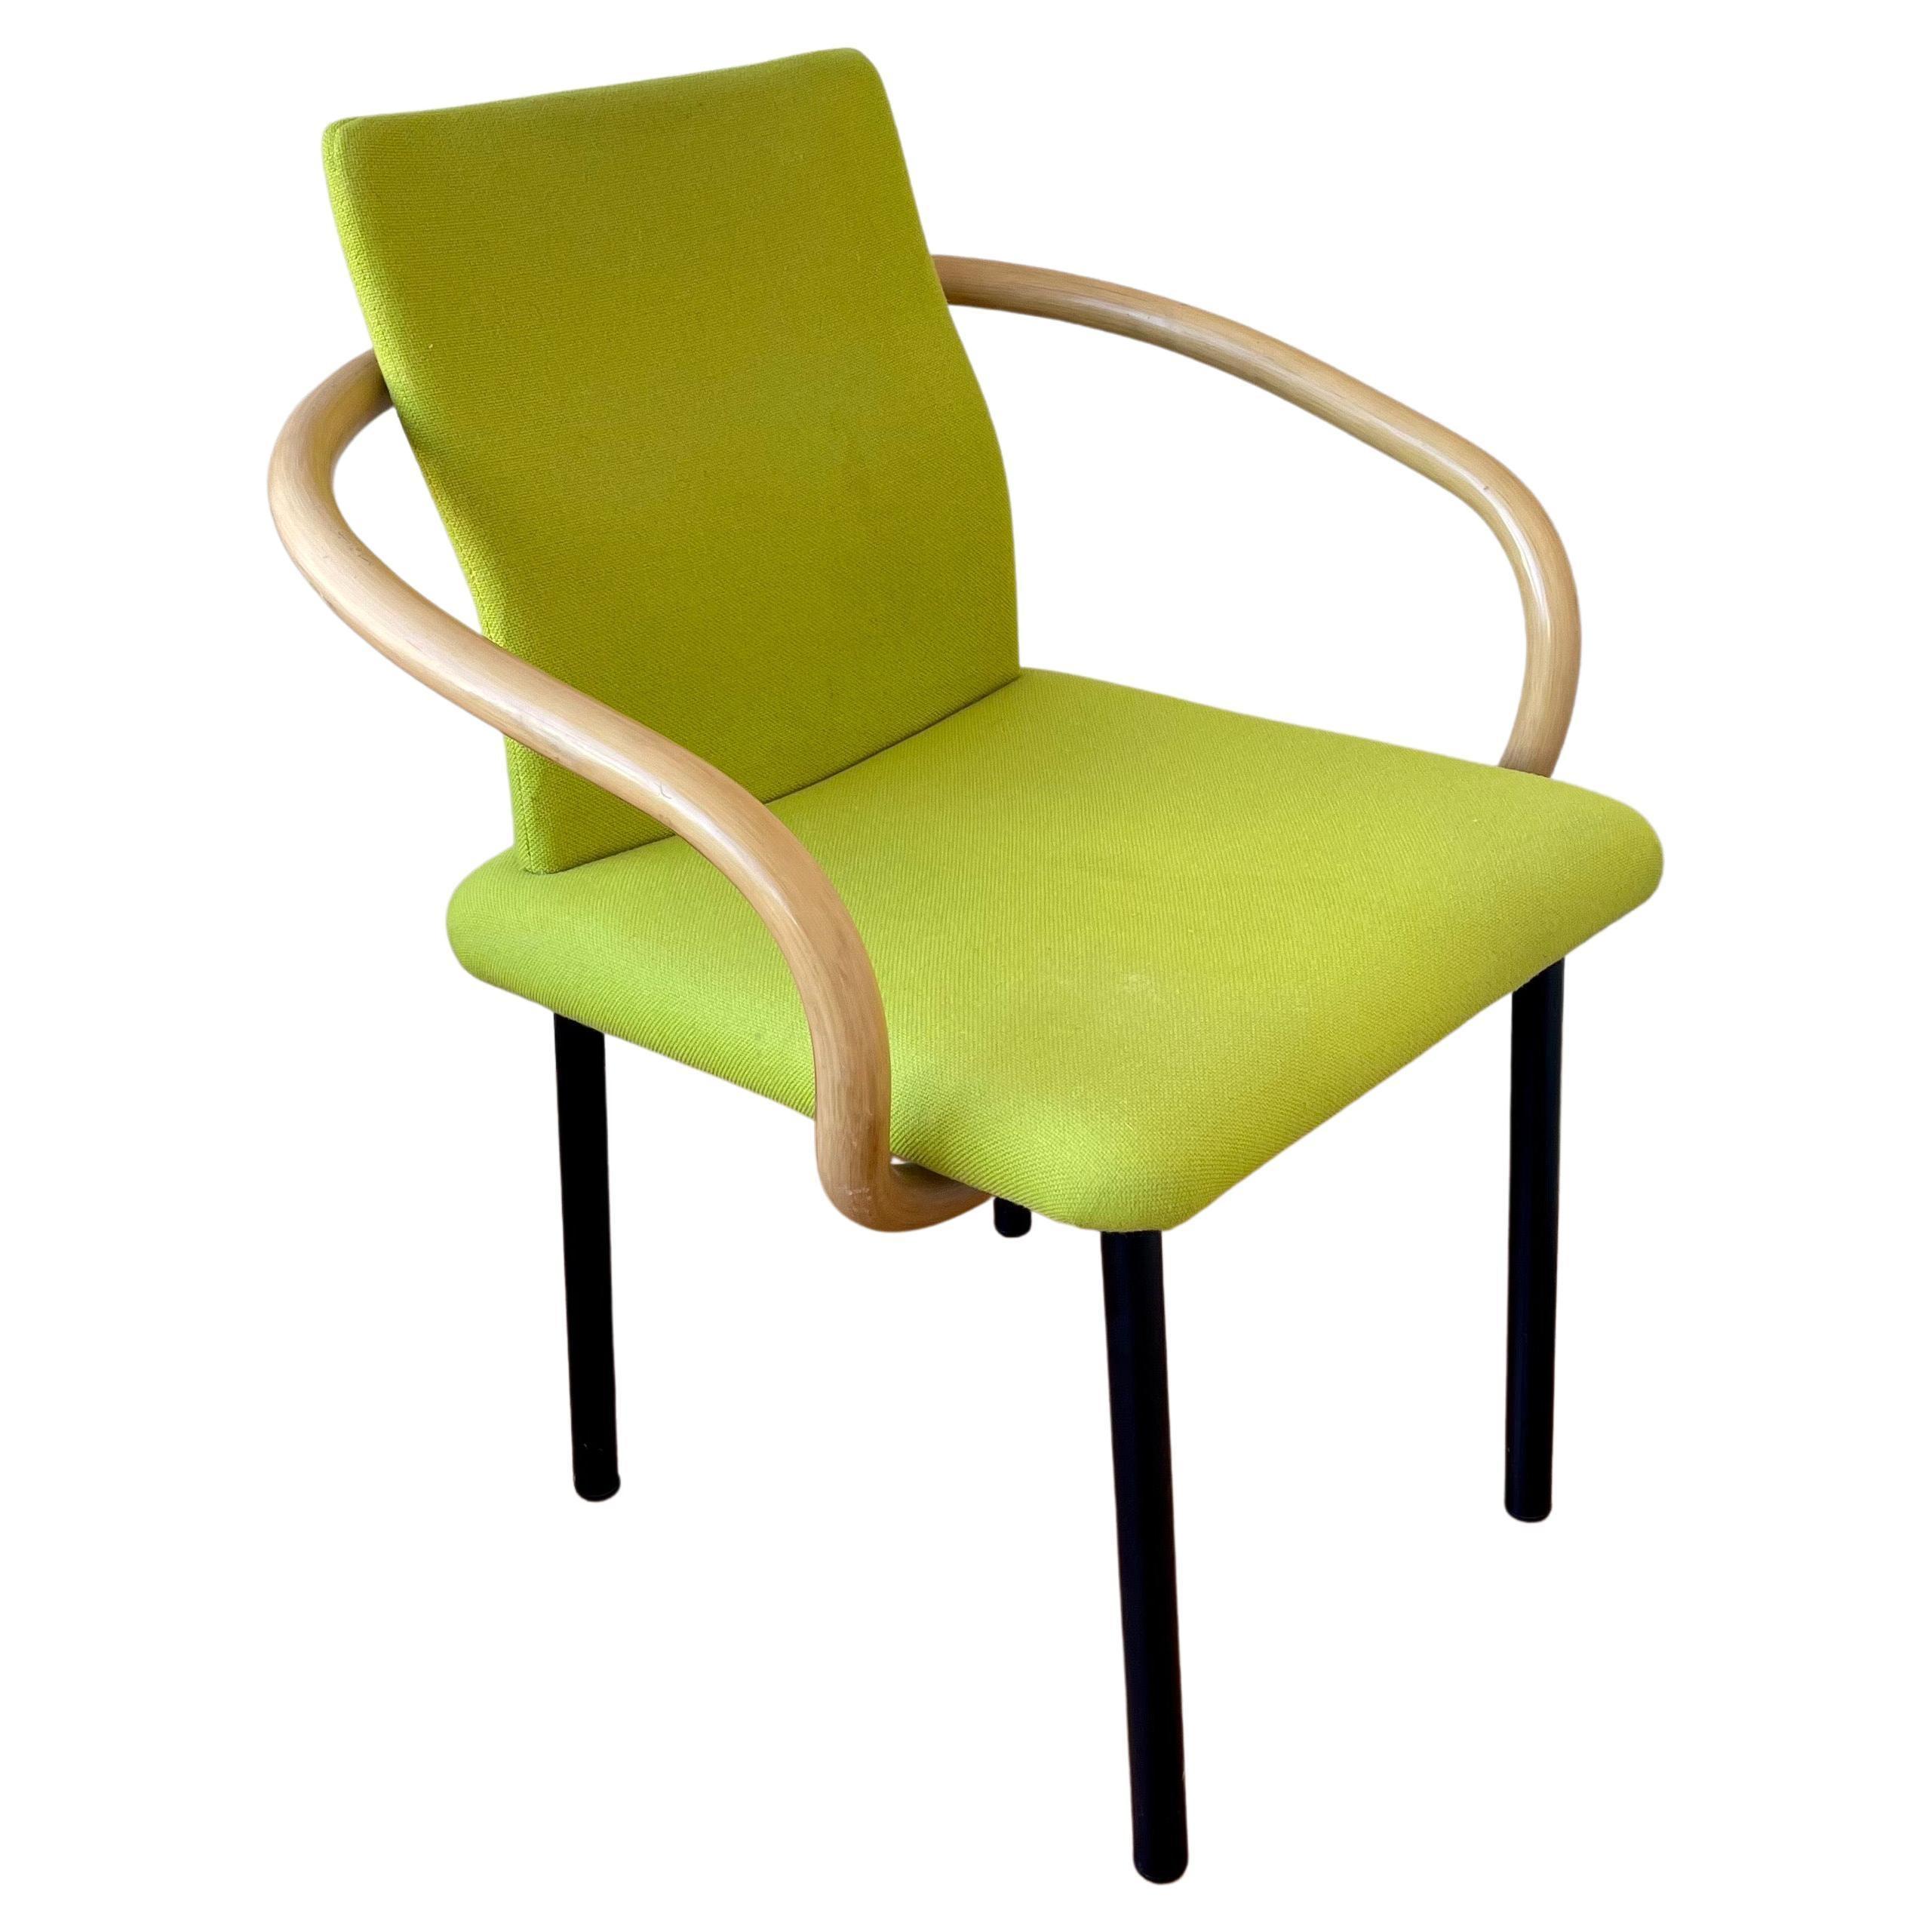 Armchair by Ettore Sottsass for Knoll Memphis Postmodern Era